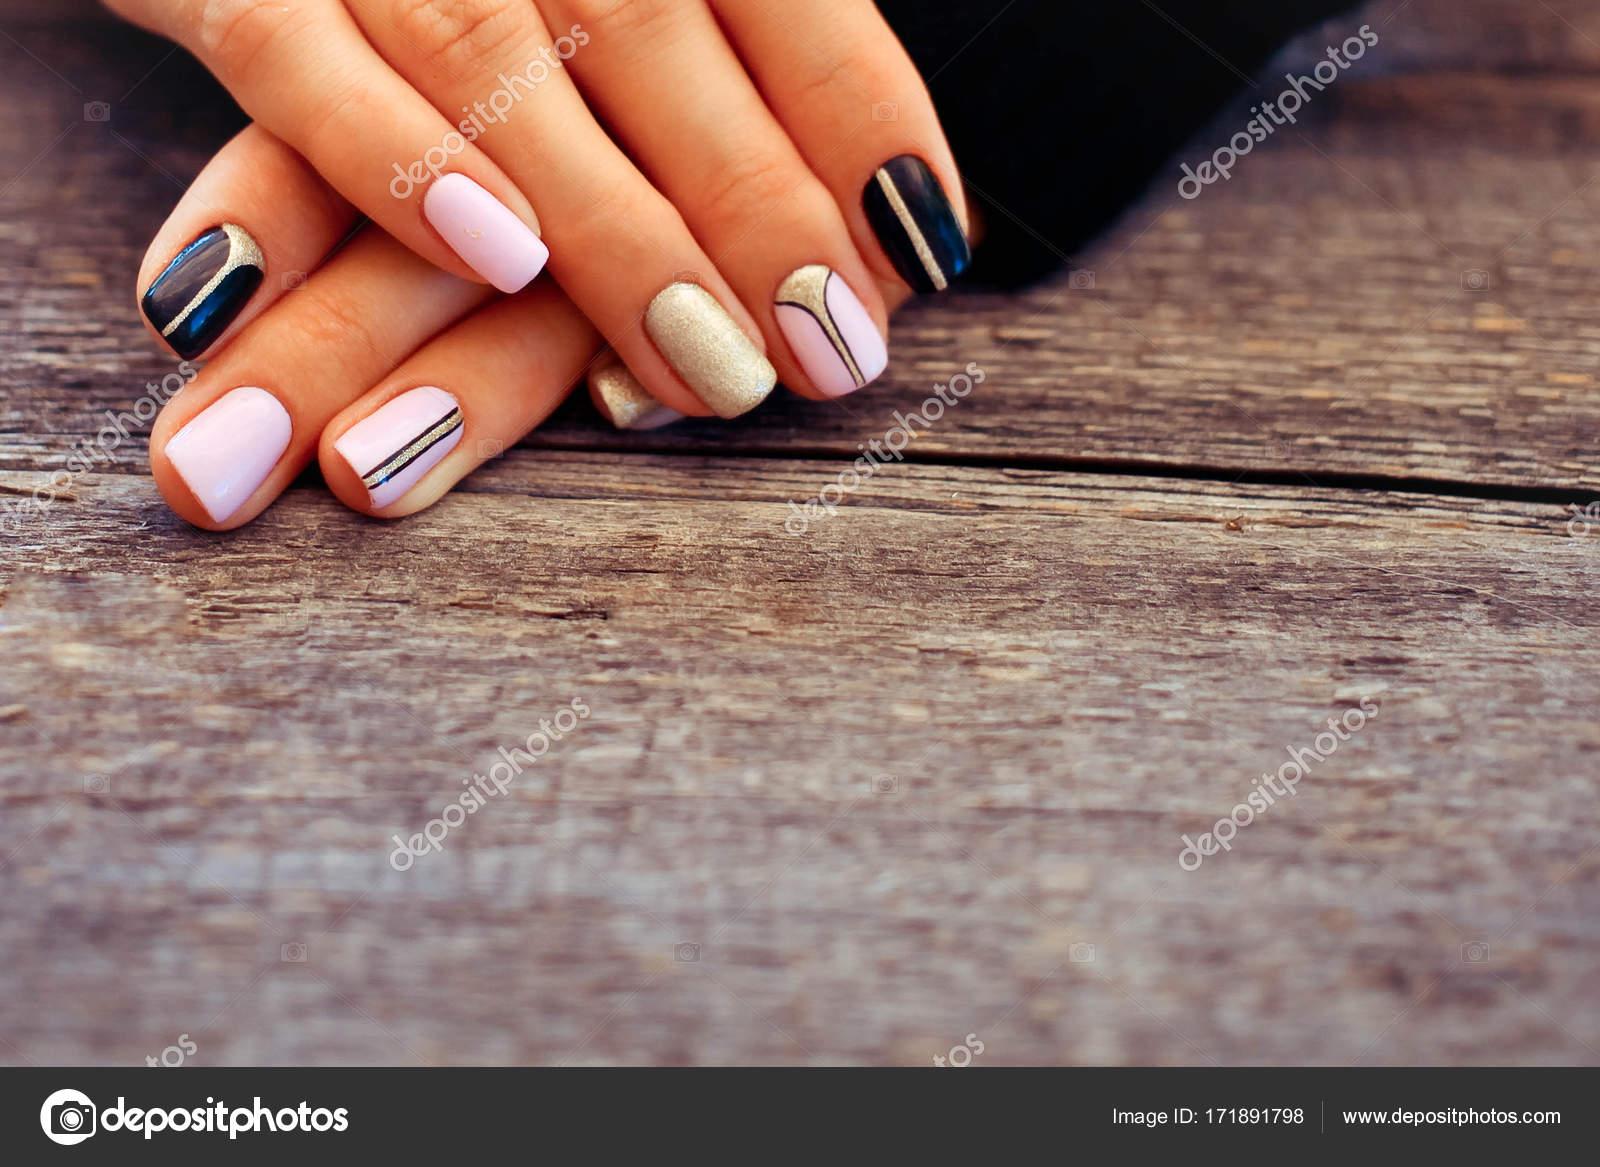 Natural nails gel polish perfect clean manicure with zero cuticle natural nails gel polish perfect clean manicure with zero cuticle nail art design publicscrutiny Gallery